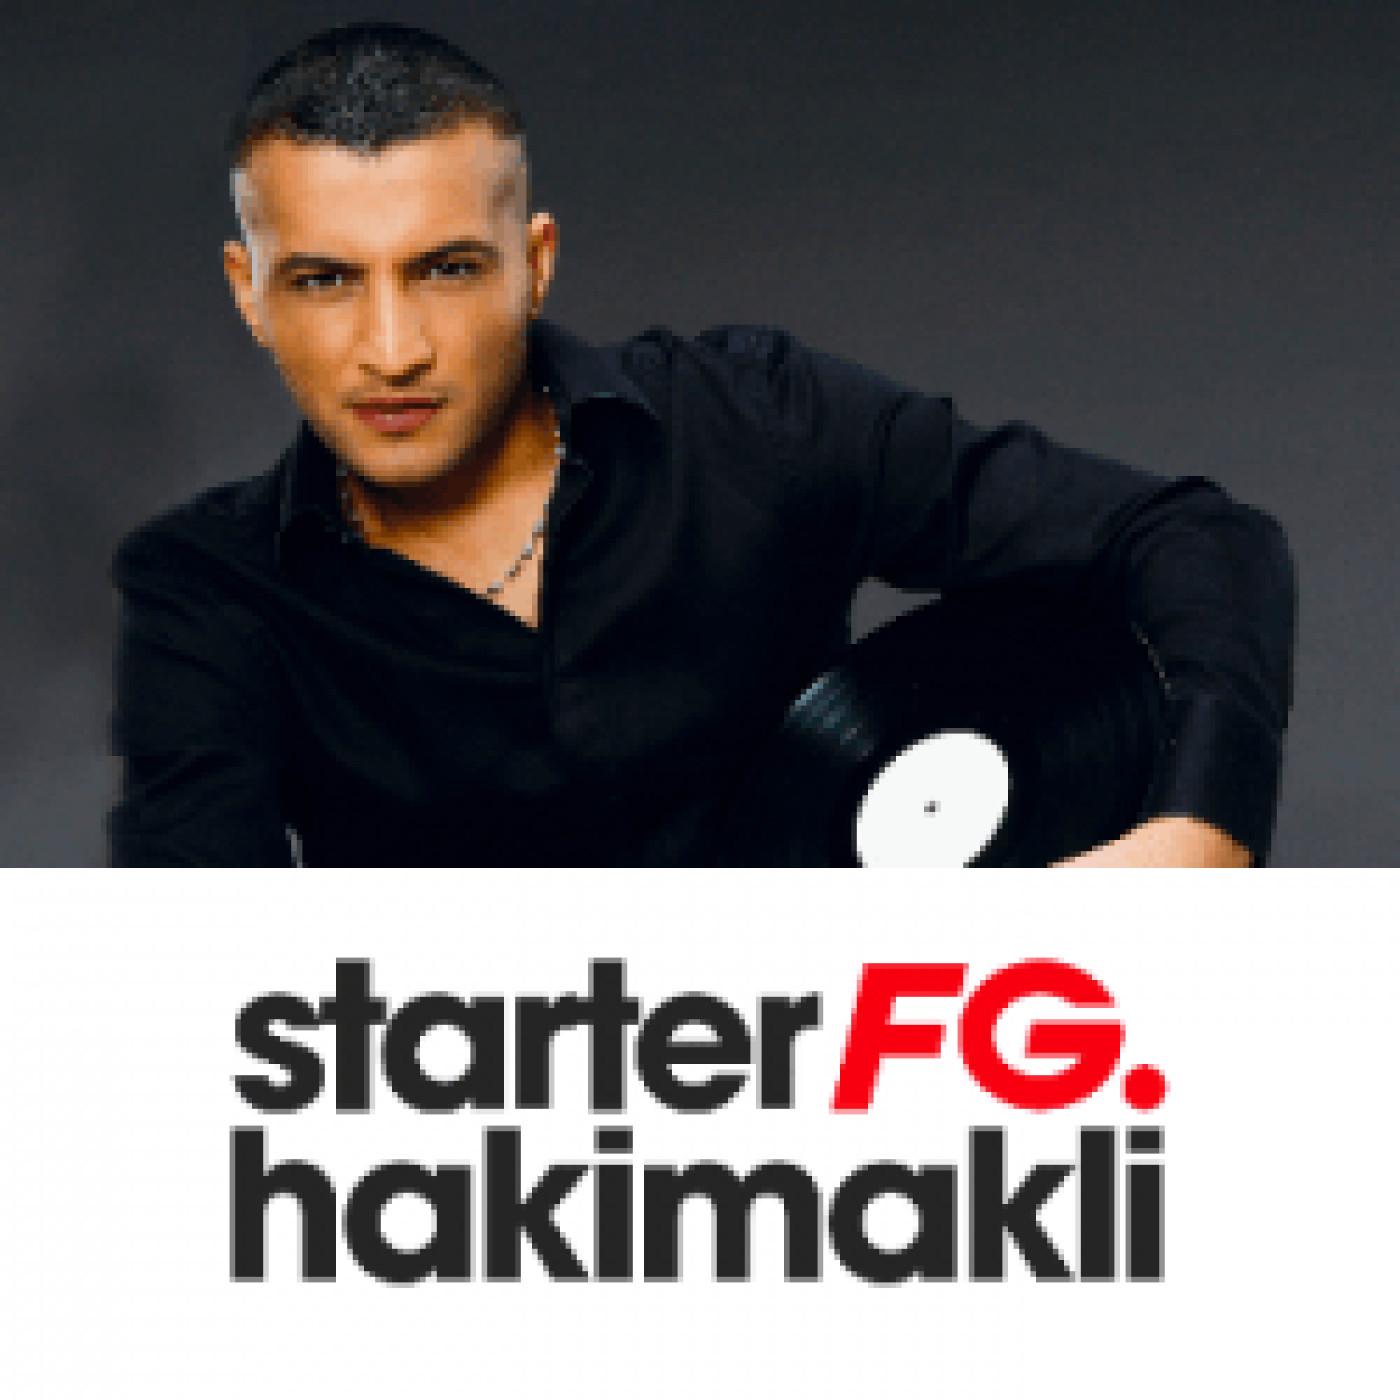 STARTER FG BY HAKIMAKLI MERCREDI 13 JANVIER 2021